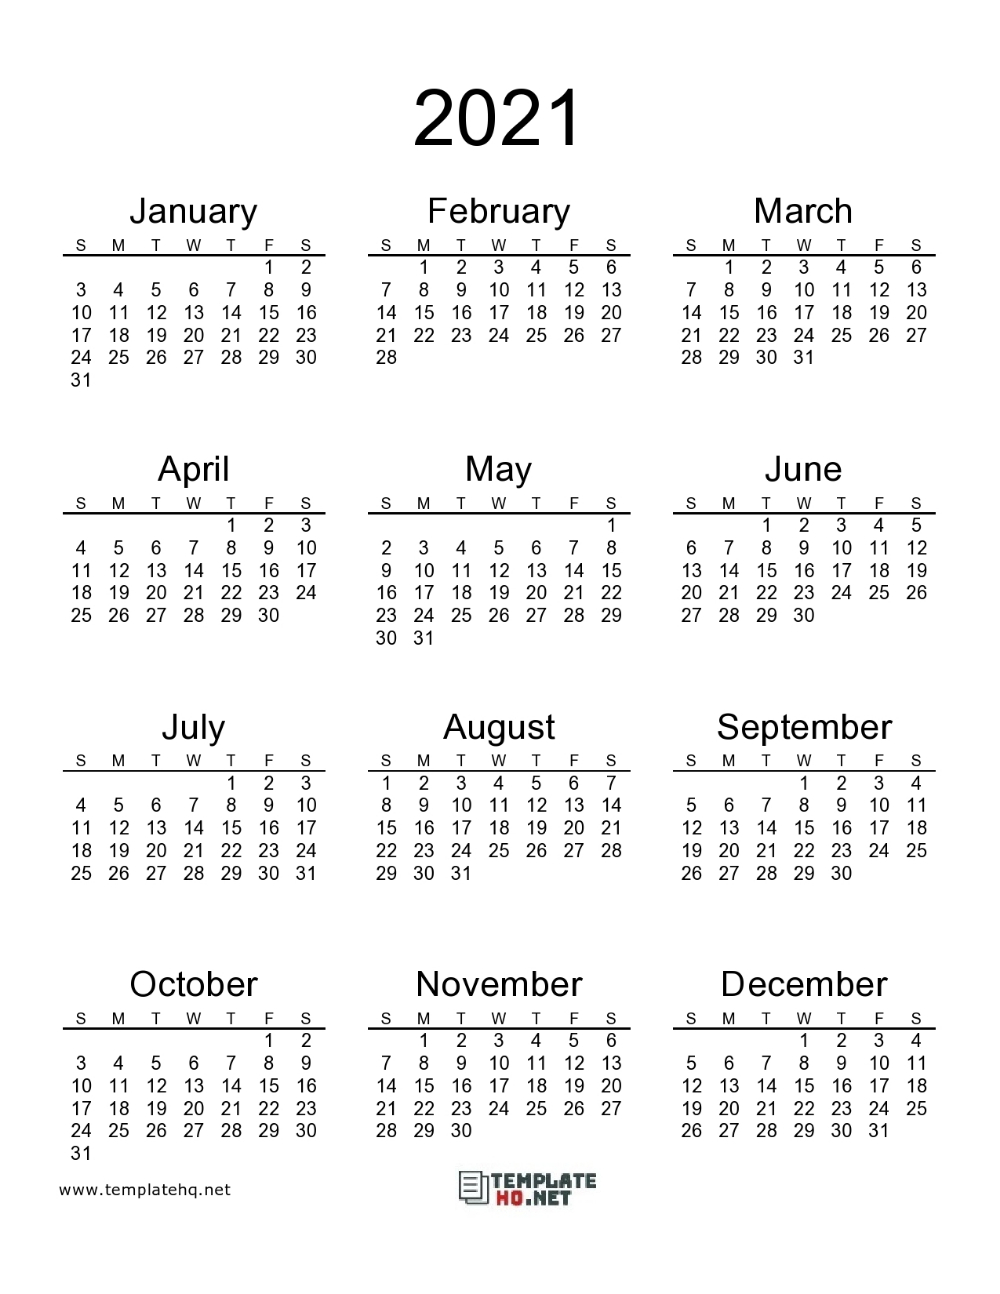 2021 Calendar Printable 00 | Calendar Printables, 2021